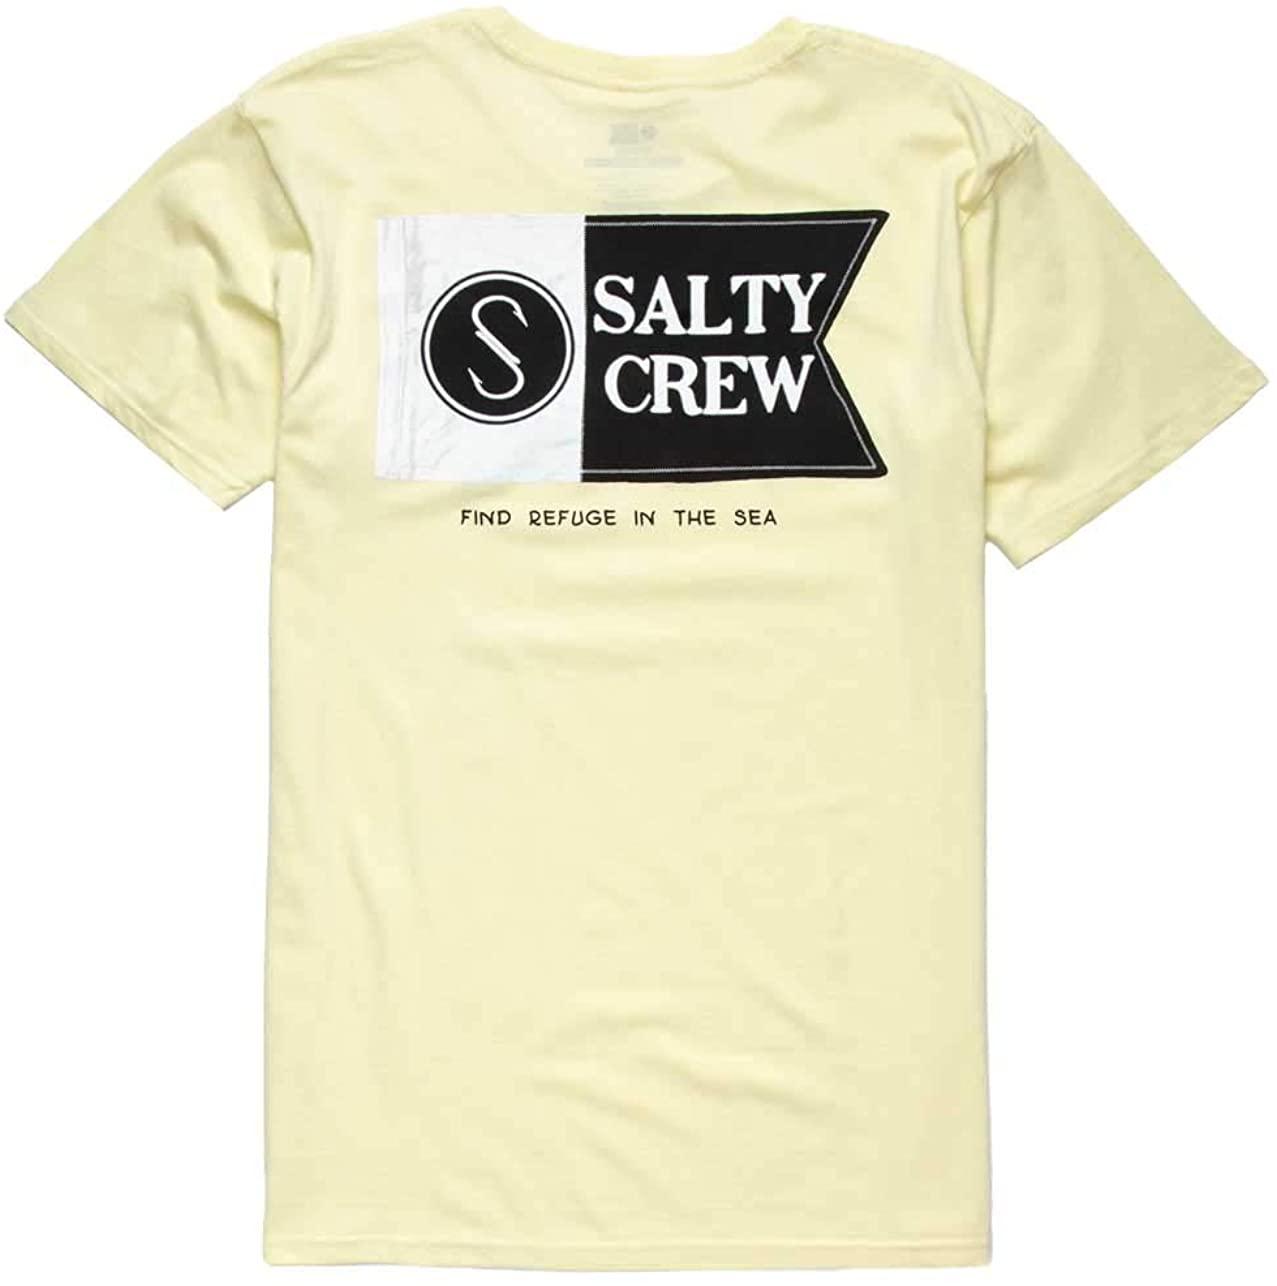 Salty Crew Patchwork Premium T-Shirt - Banana - LG